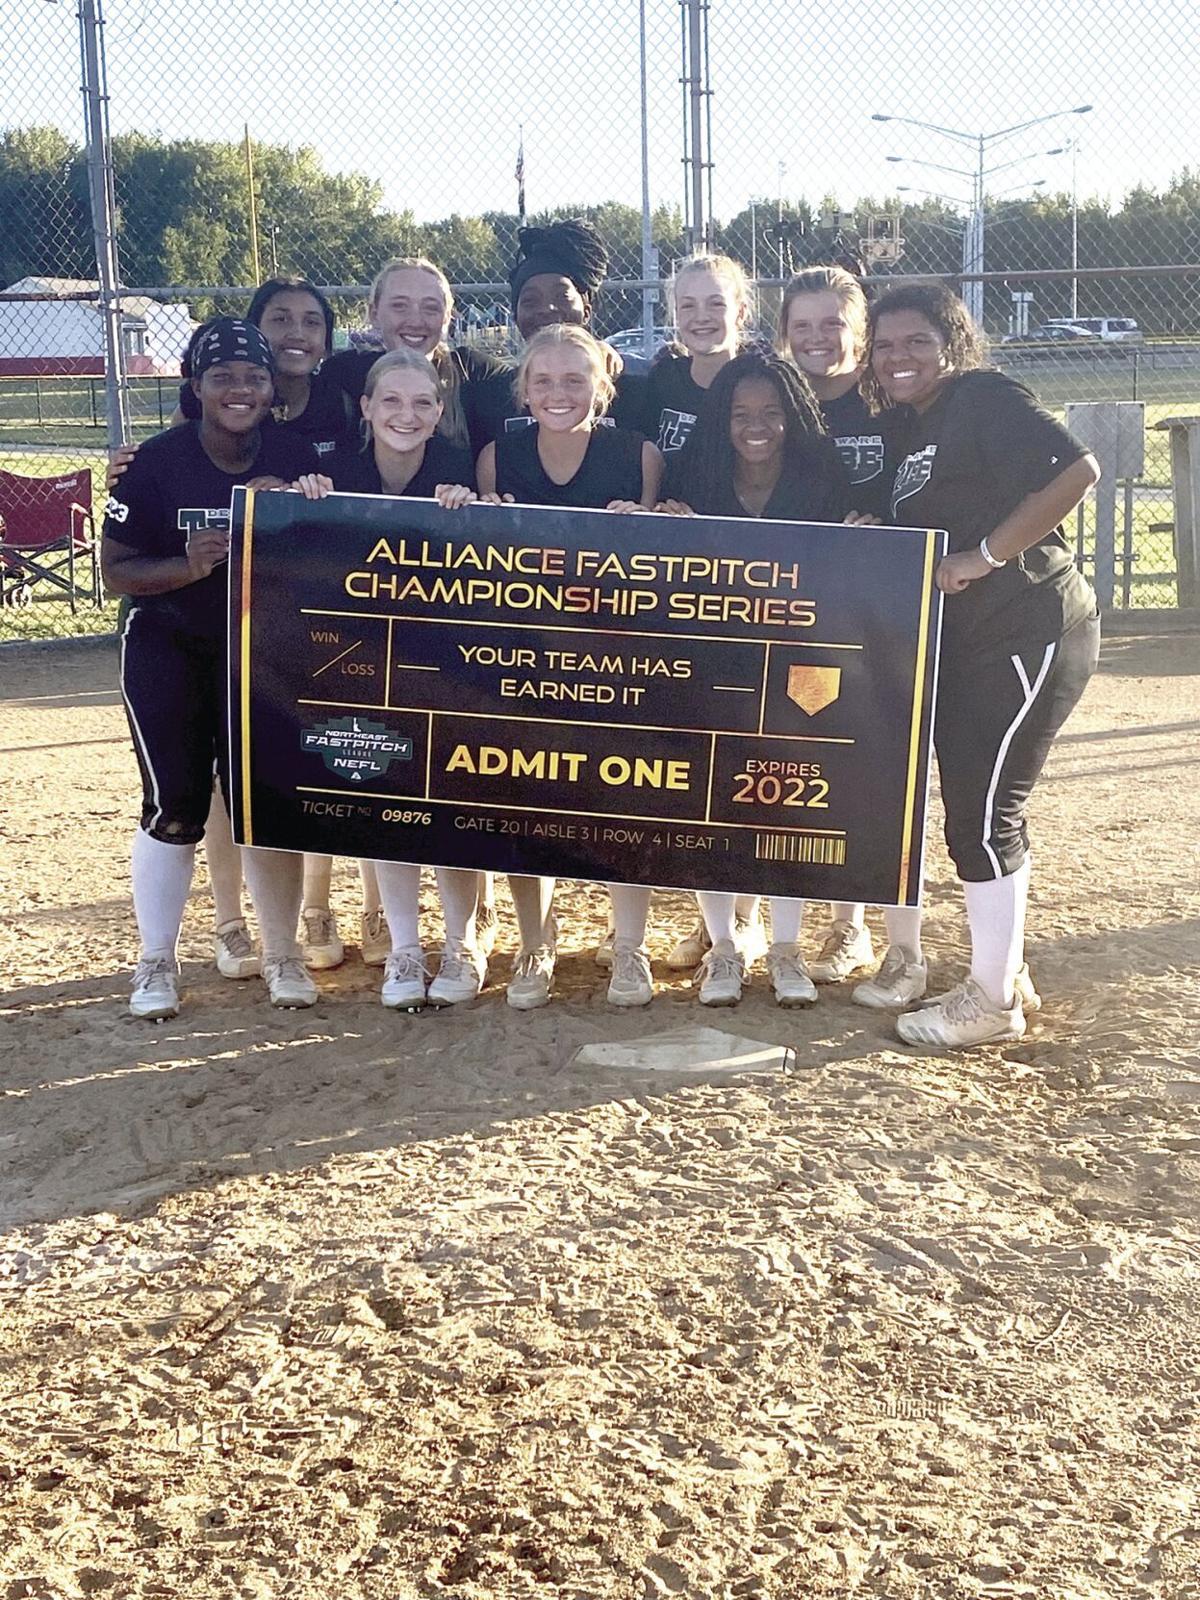 Delaware Tribe 16U team 2021